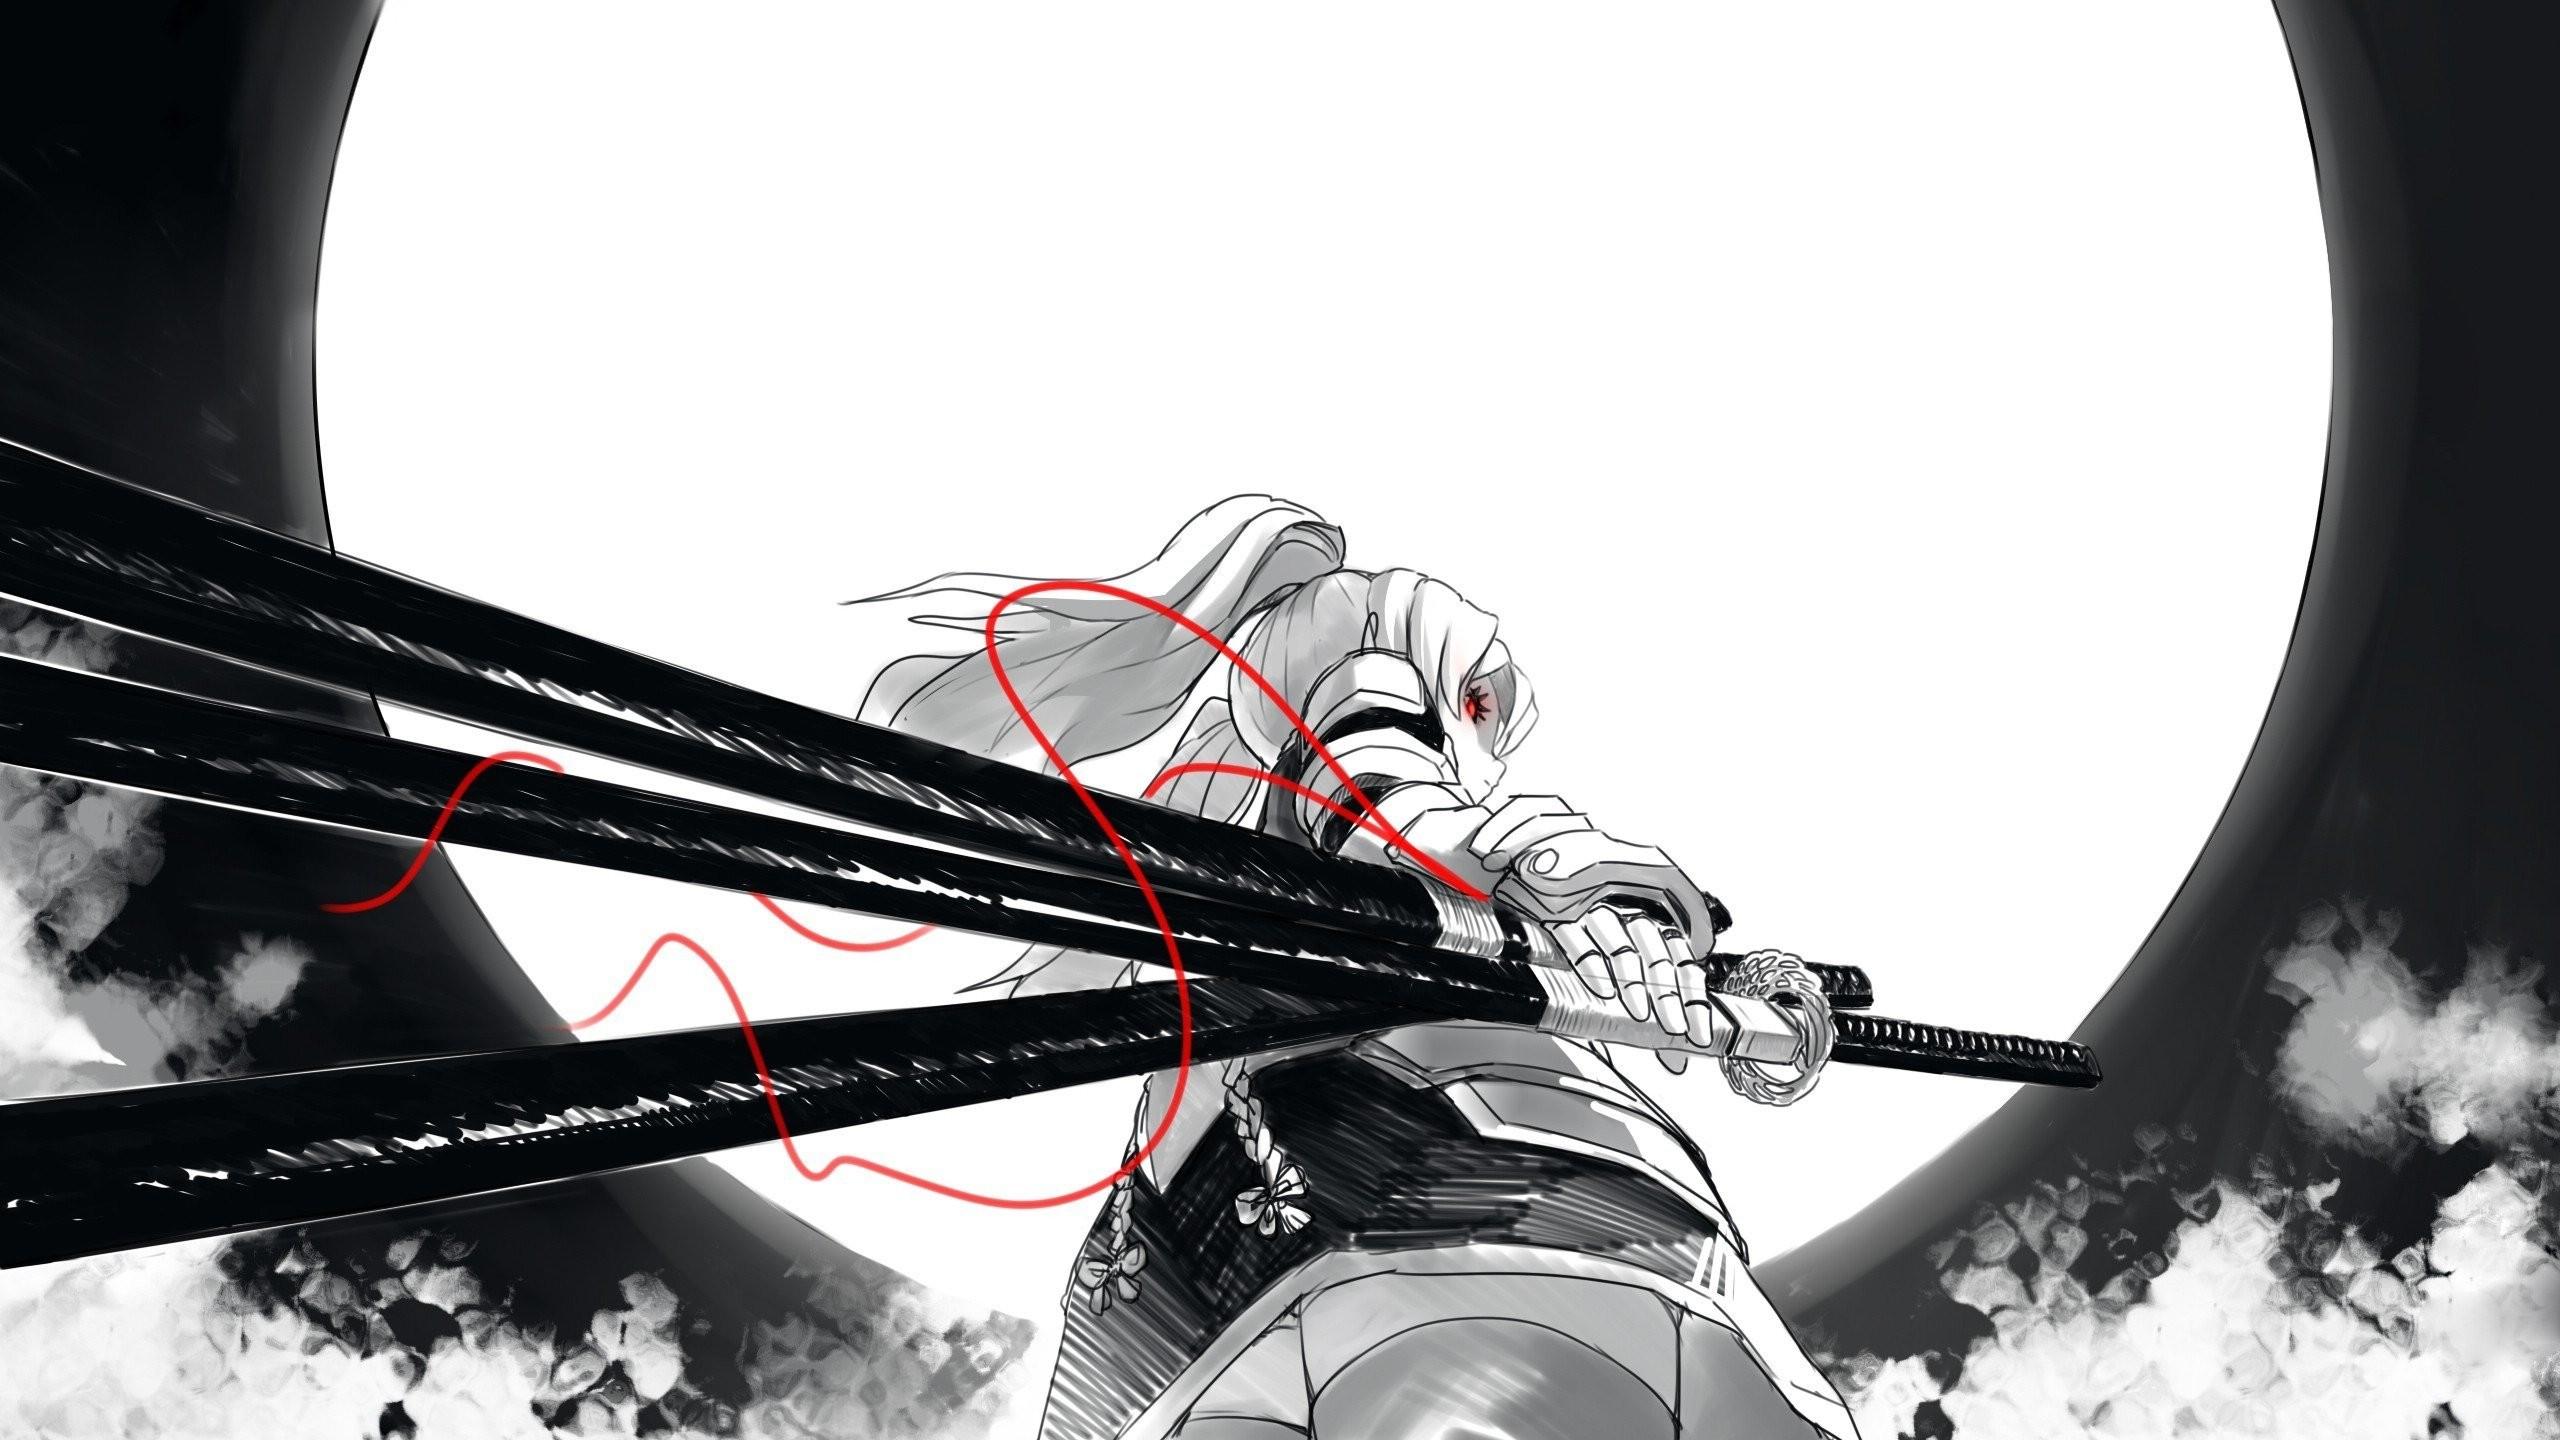 wallpaper.wiki-Samurai-woman-sword-wallpapers-PIC-WPE0010441 2560x1440